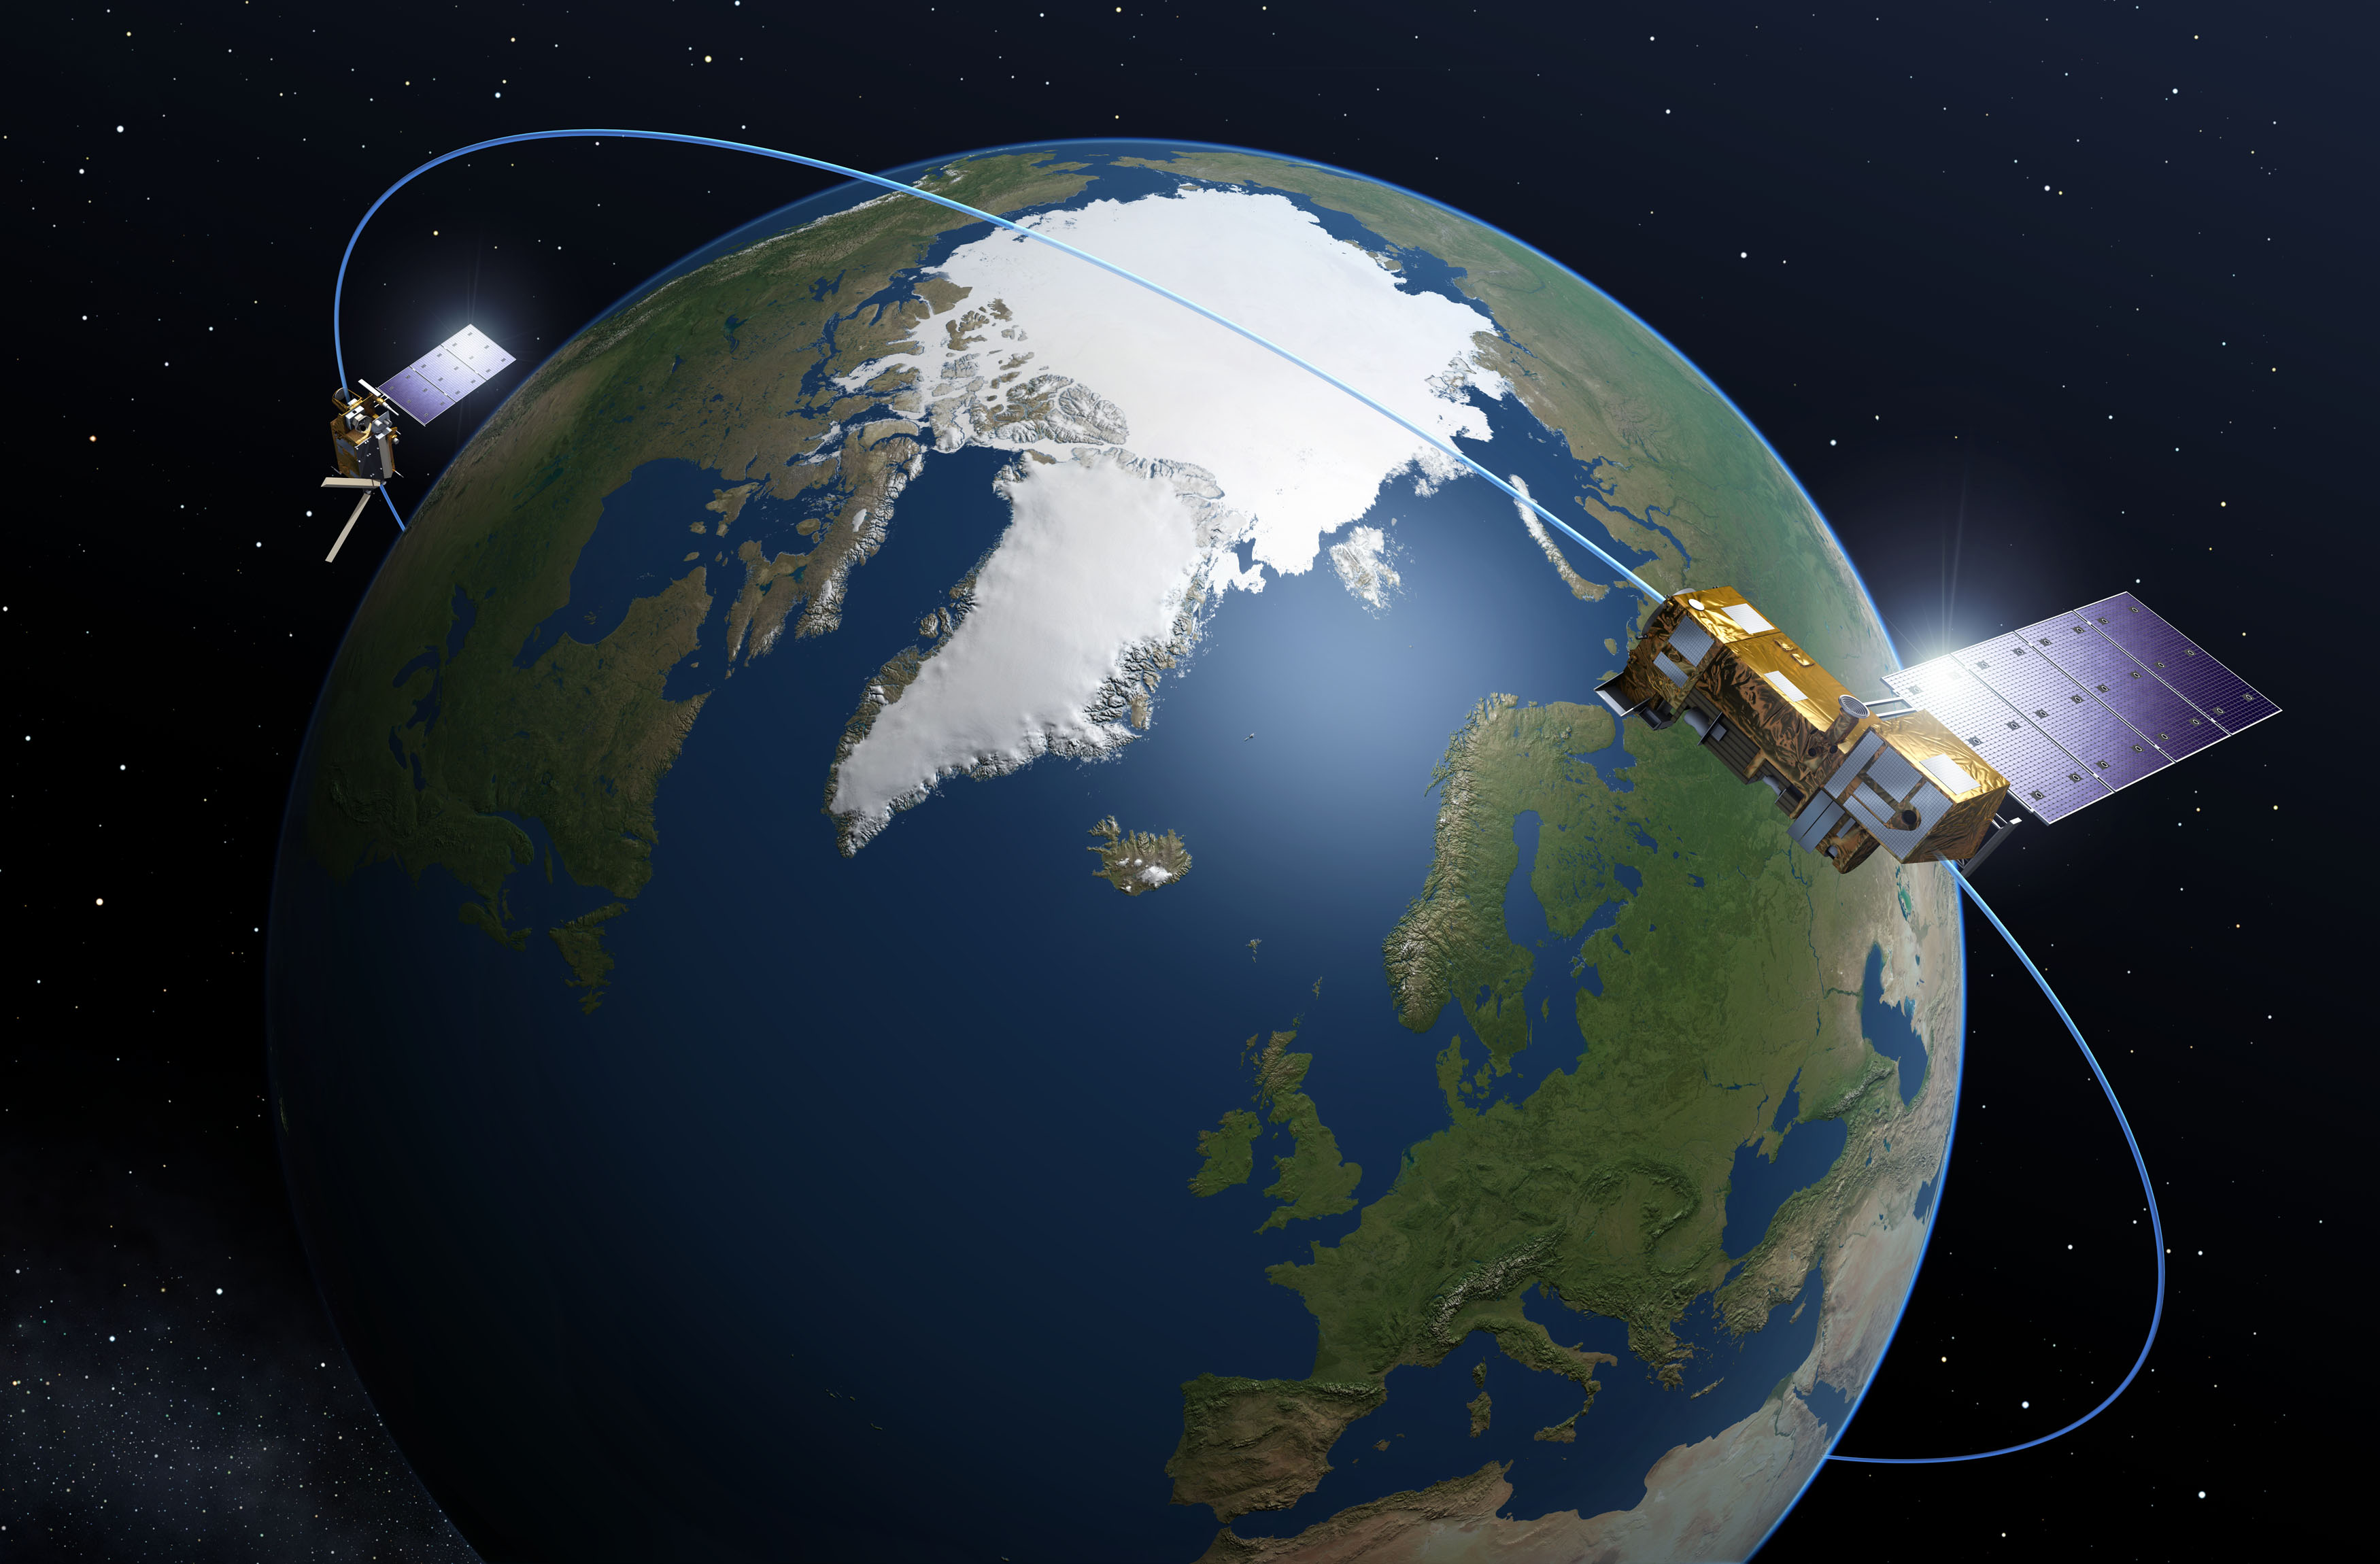 Картинки спутник вокруг земли